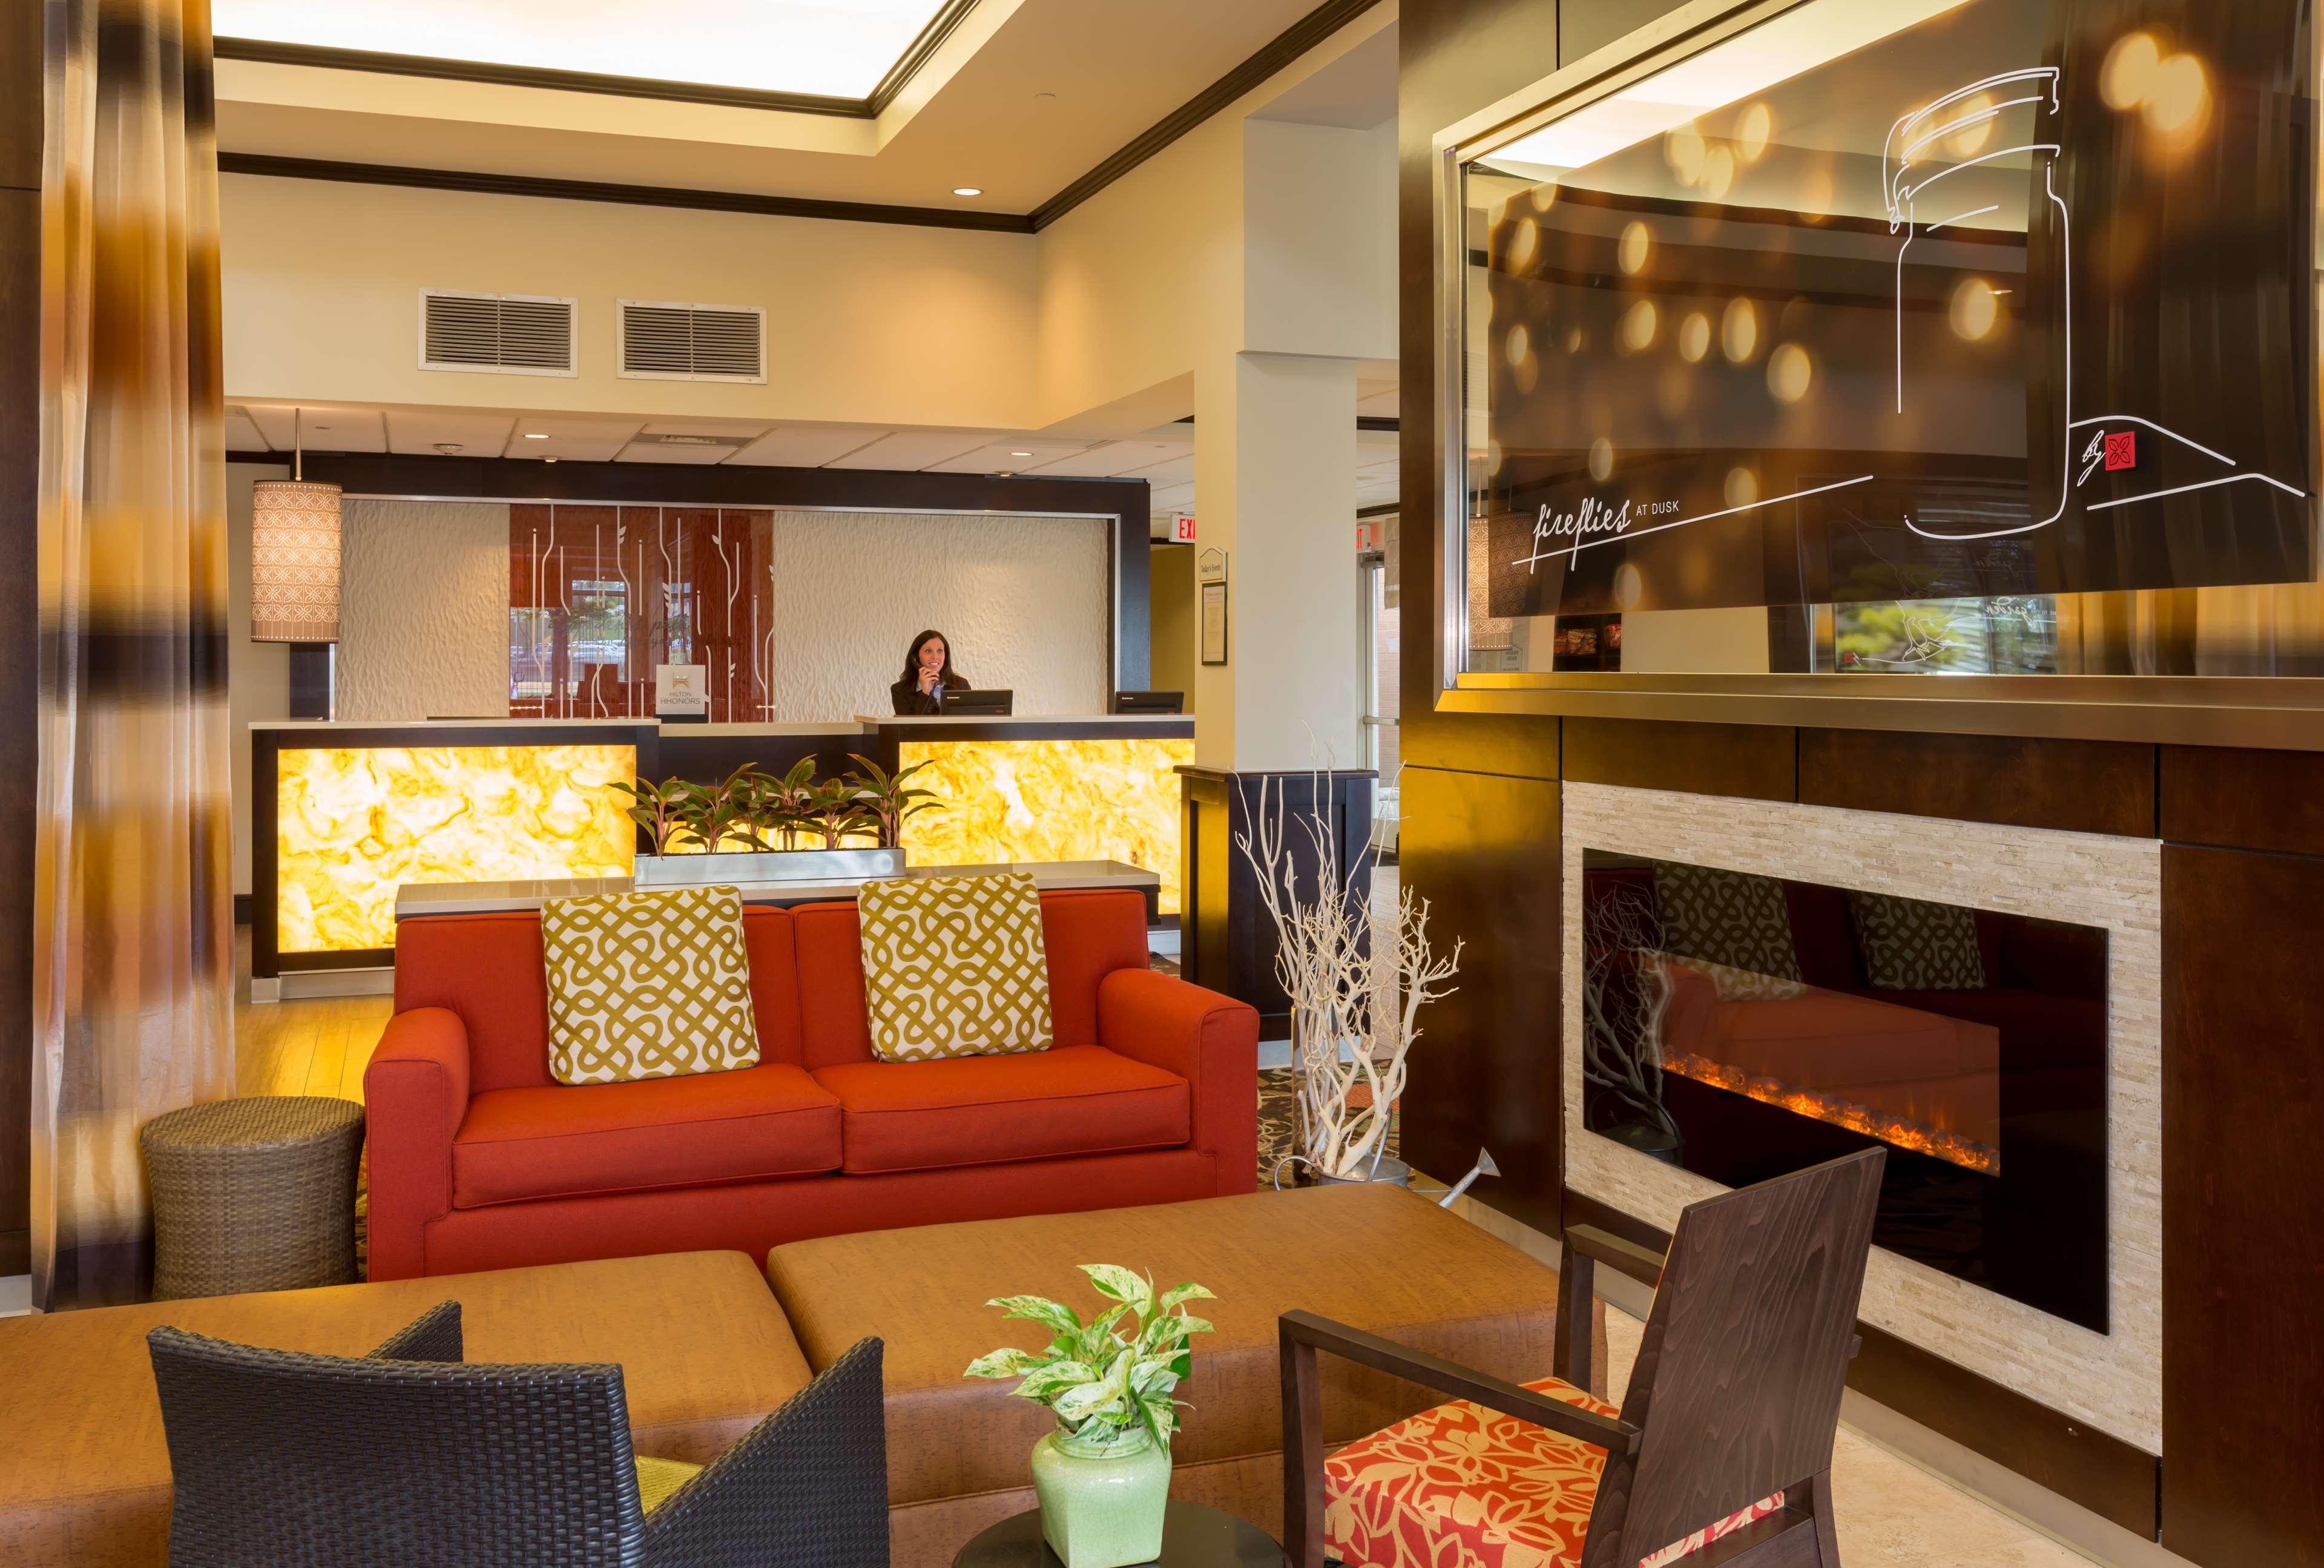 Hilton Garden Inn Buffalo Airport Erie Price Address Reviews